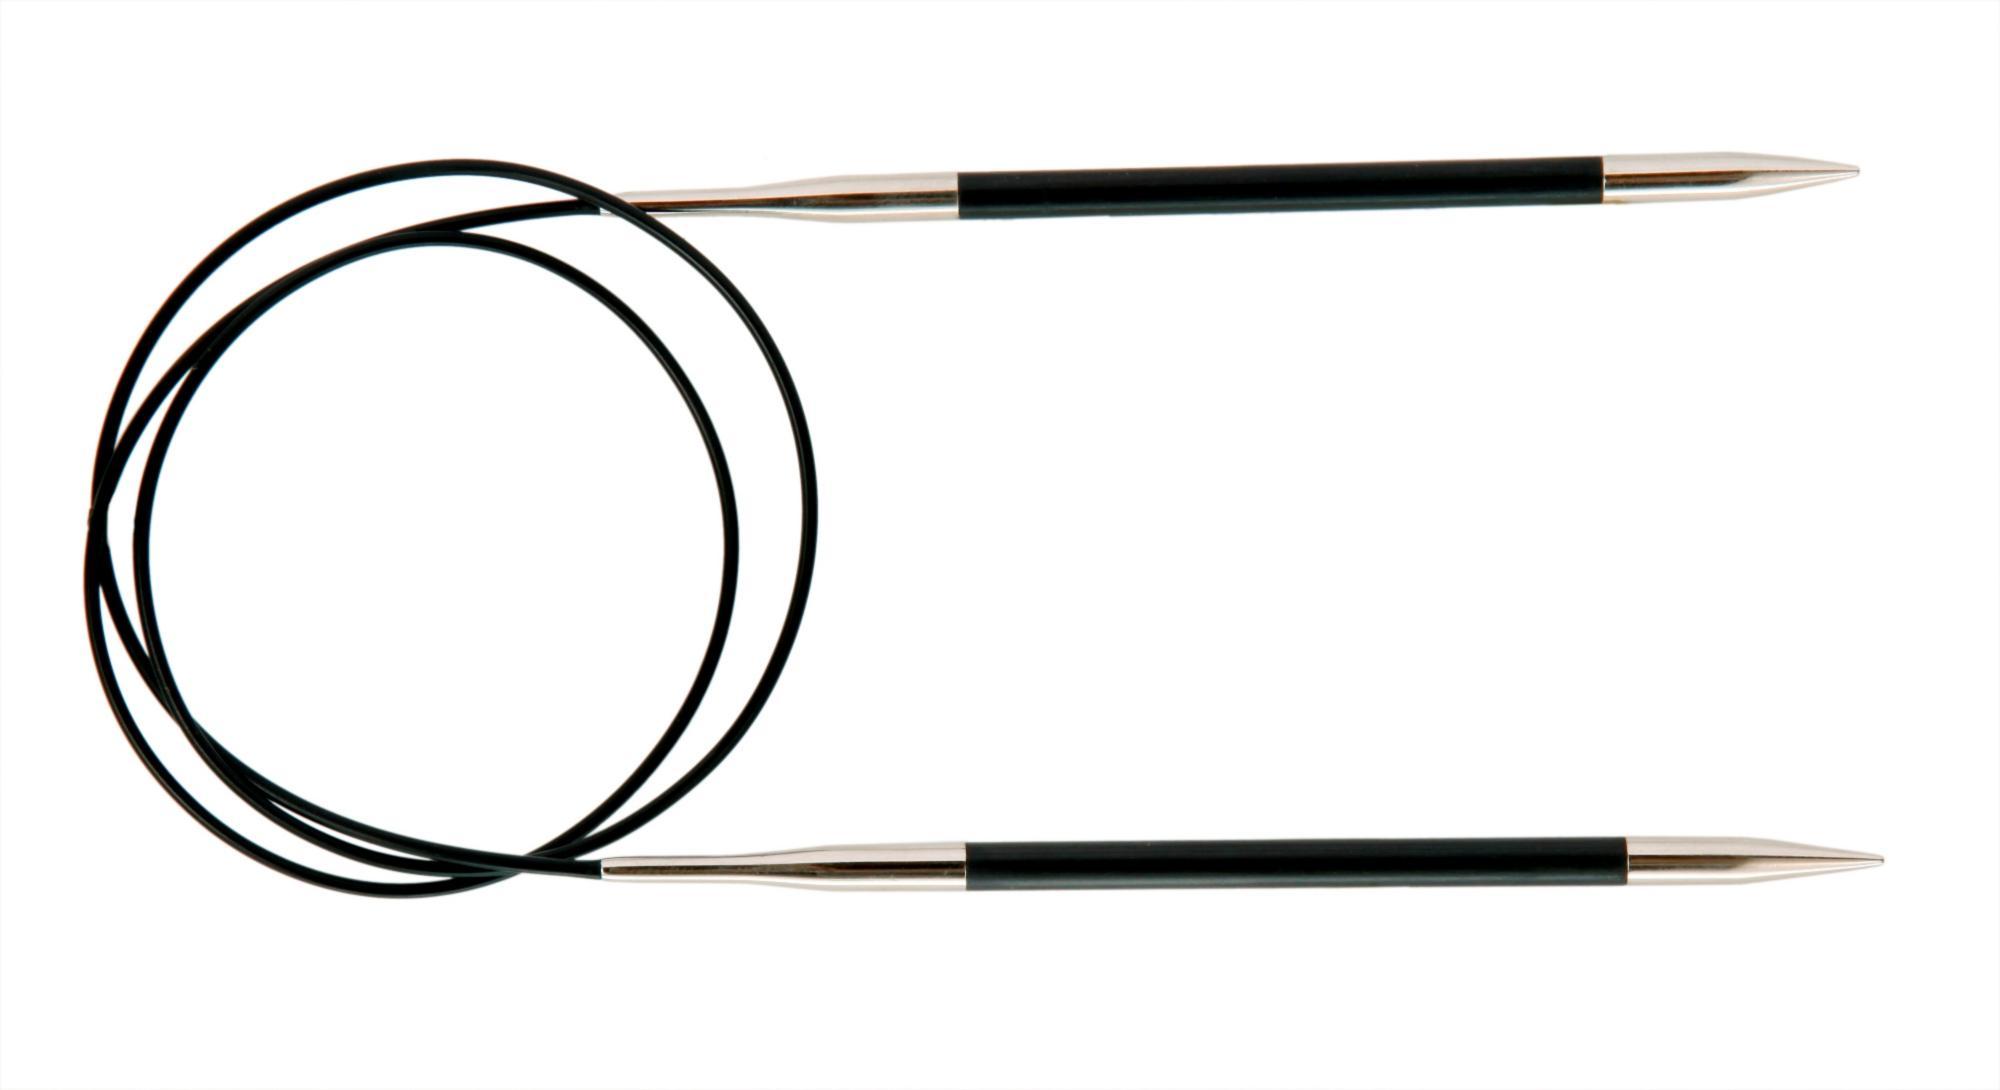 Спицы круговые 40 см Karbonz KnitPro, 41143, 2.75 мм